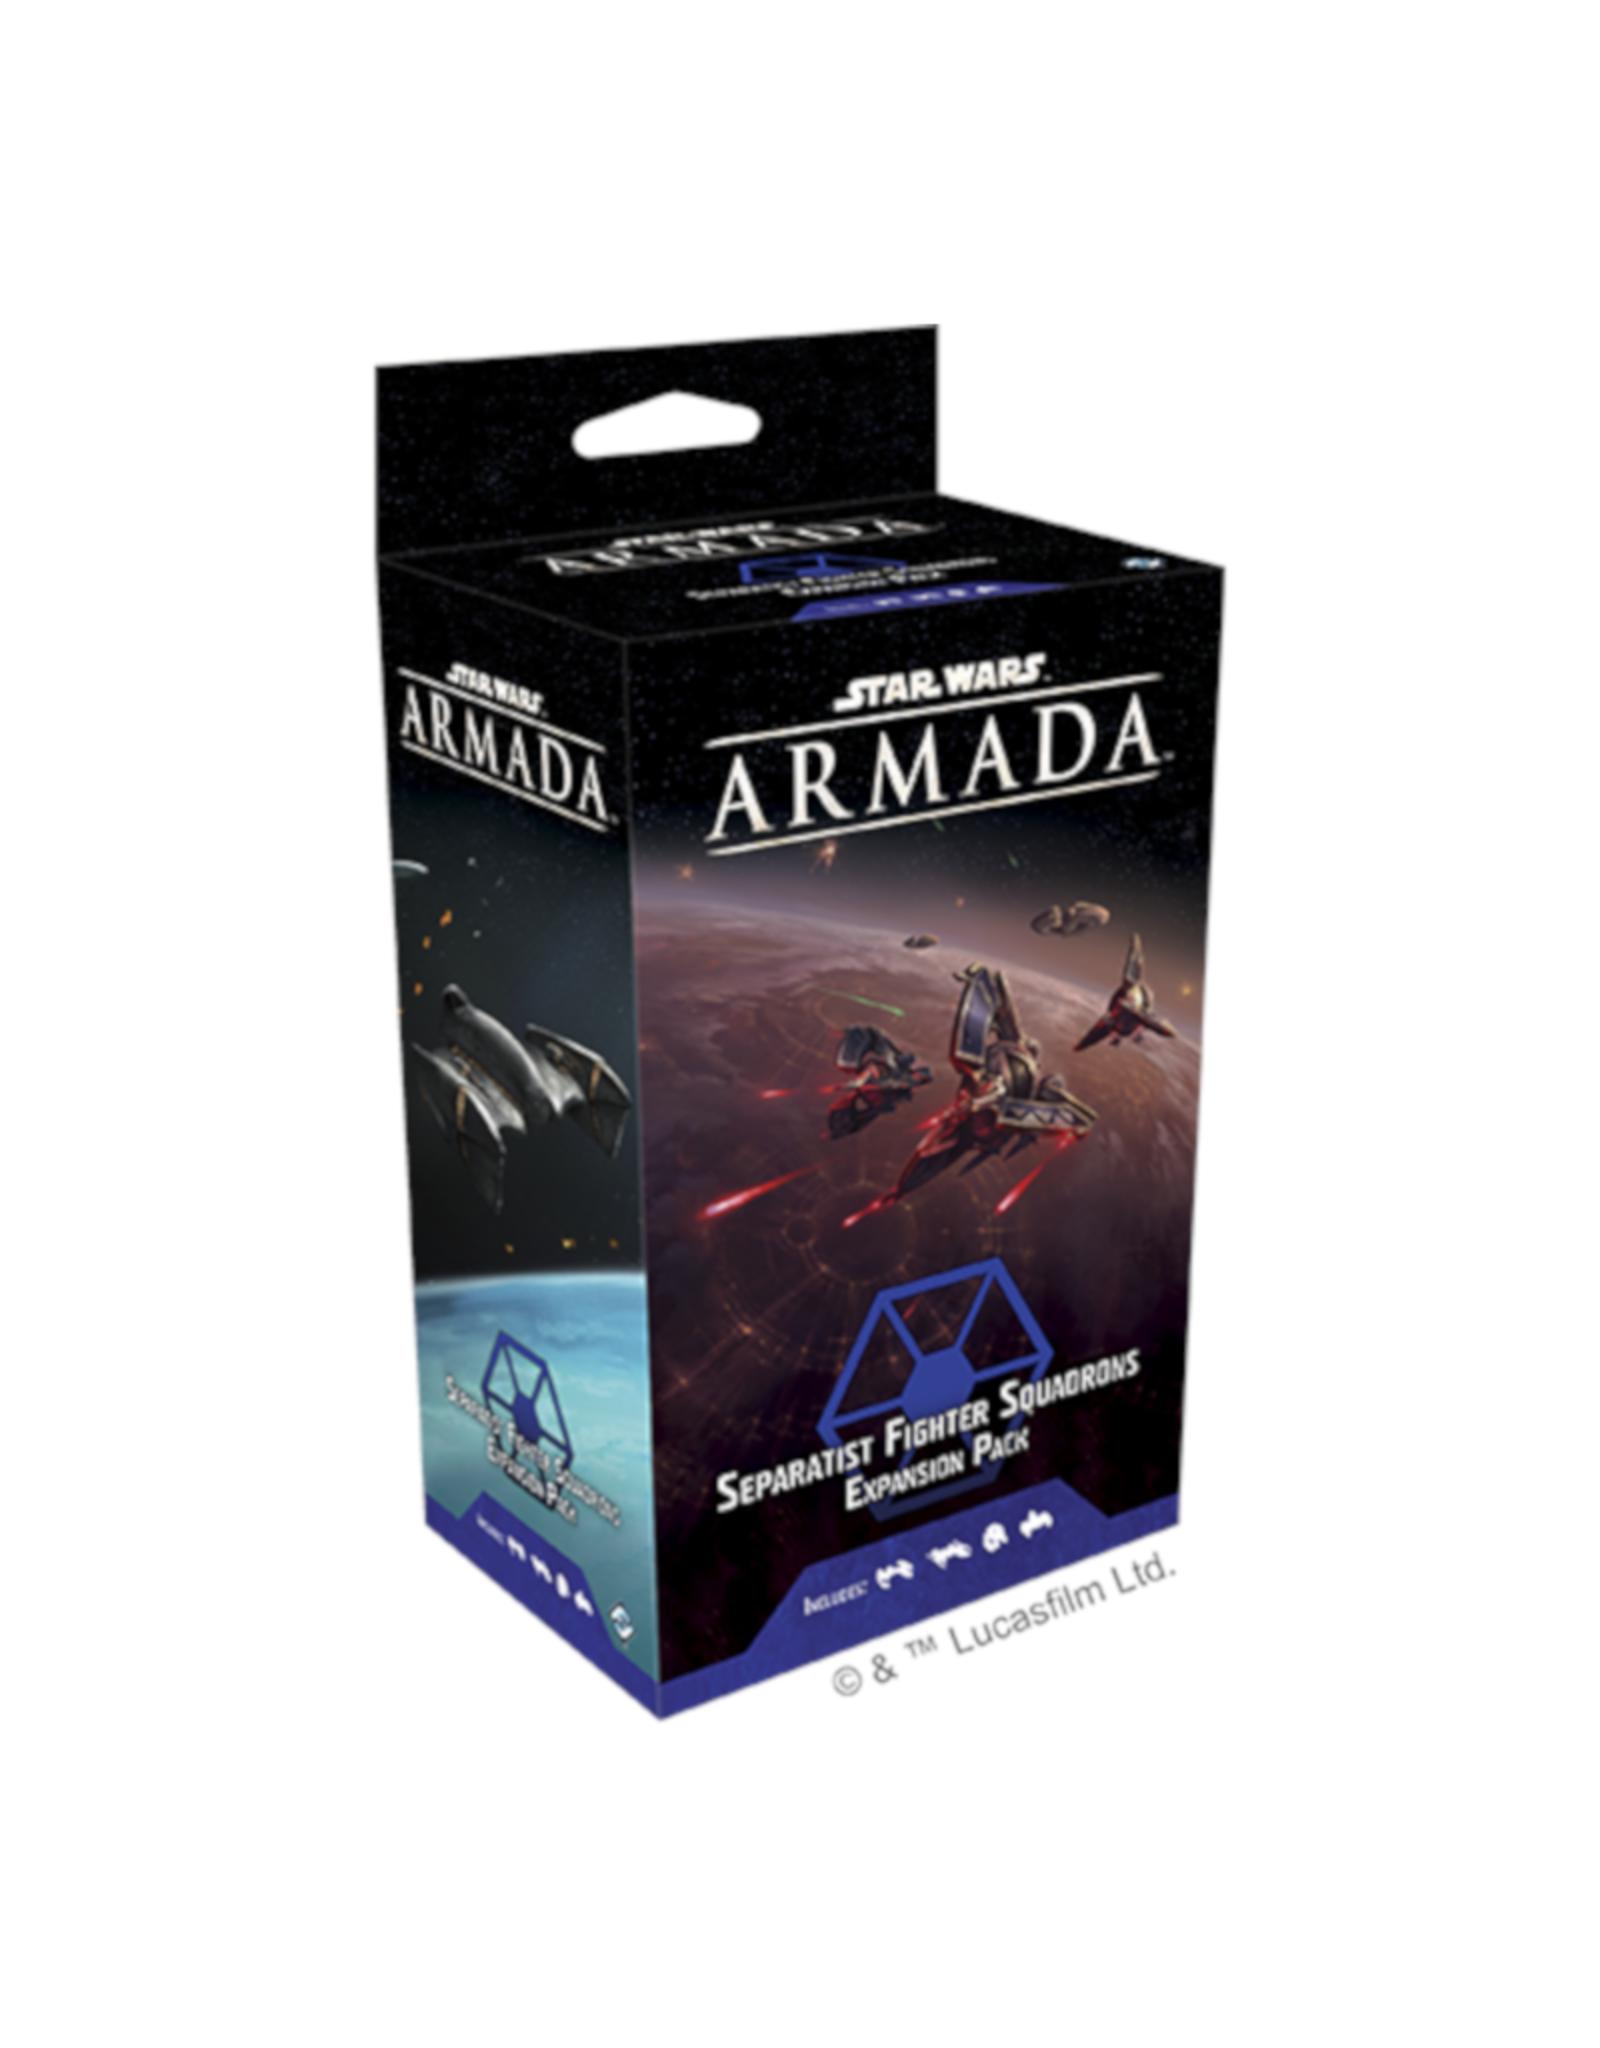 Fantasy Flight Games Star Wars Armada Separatist Alliance Squad Expansion